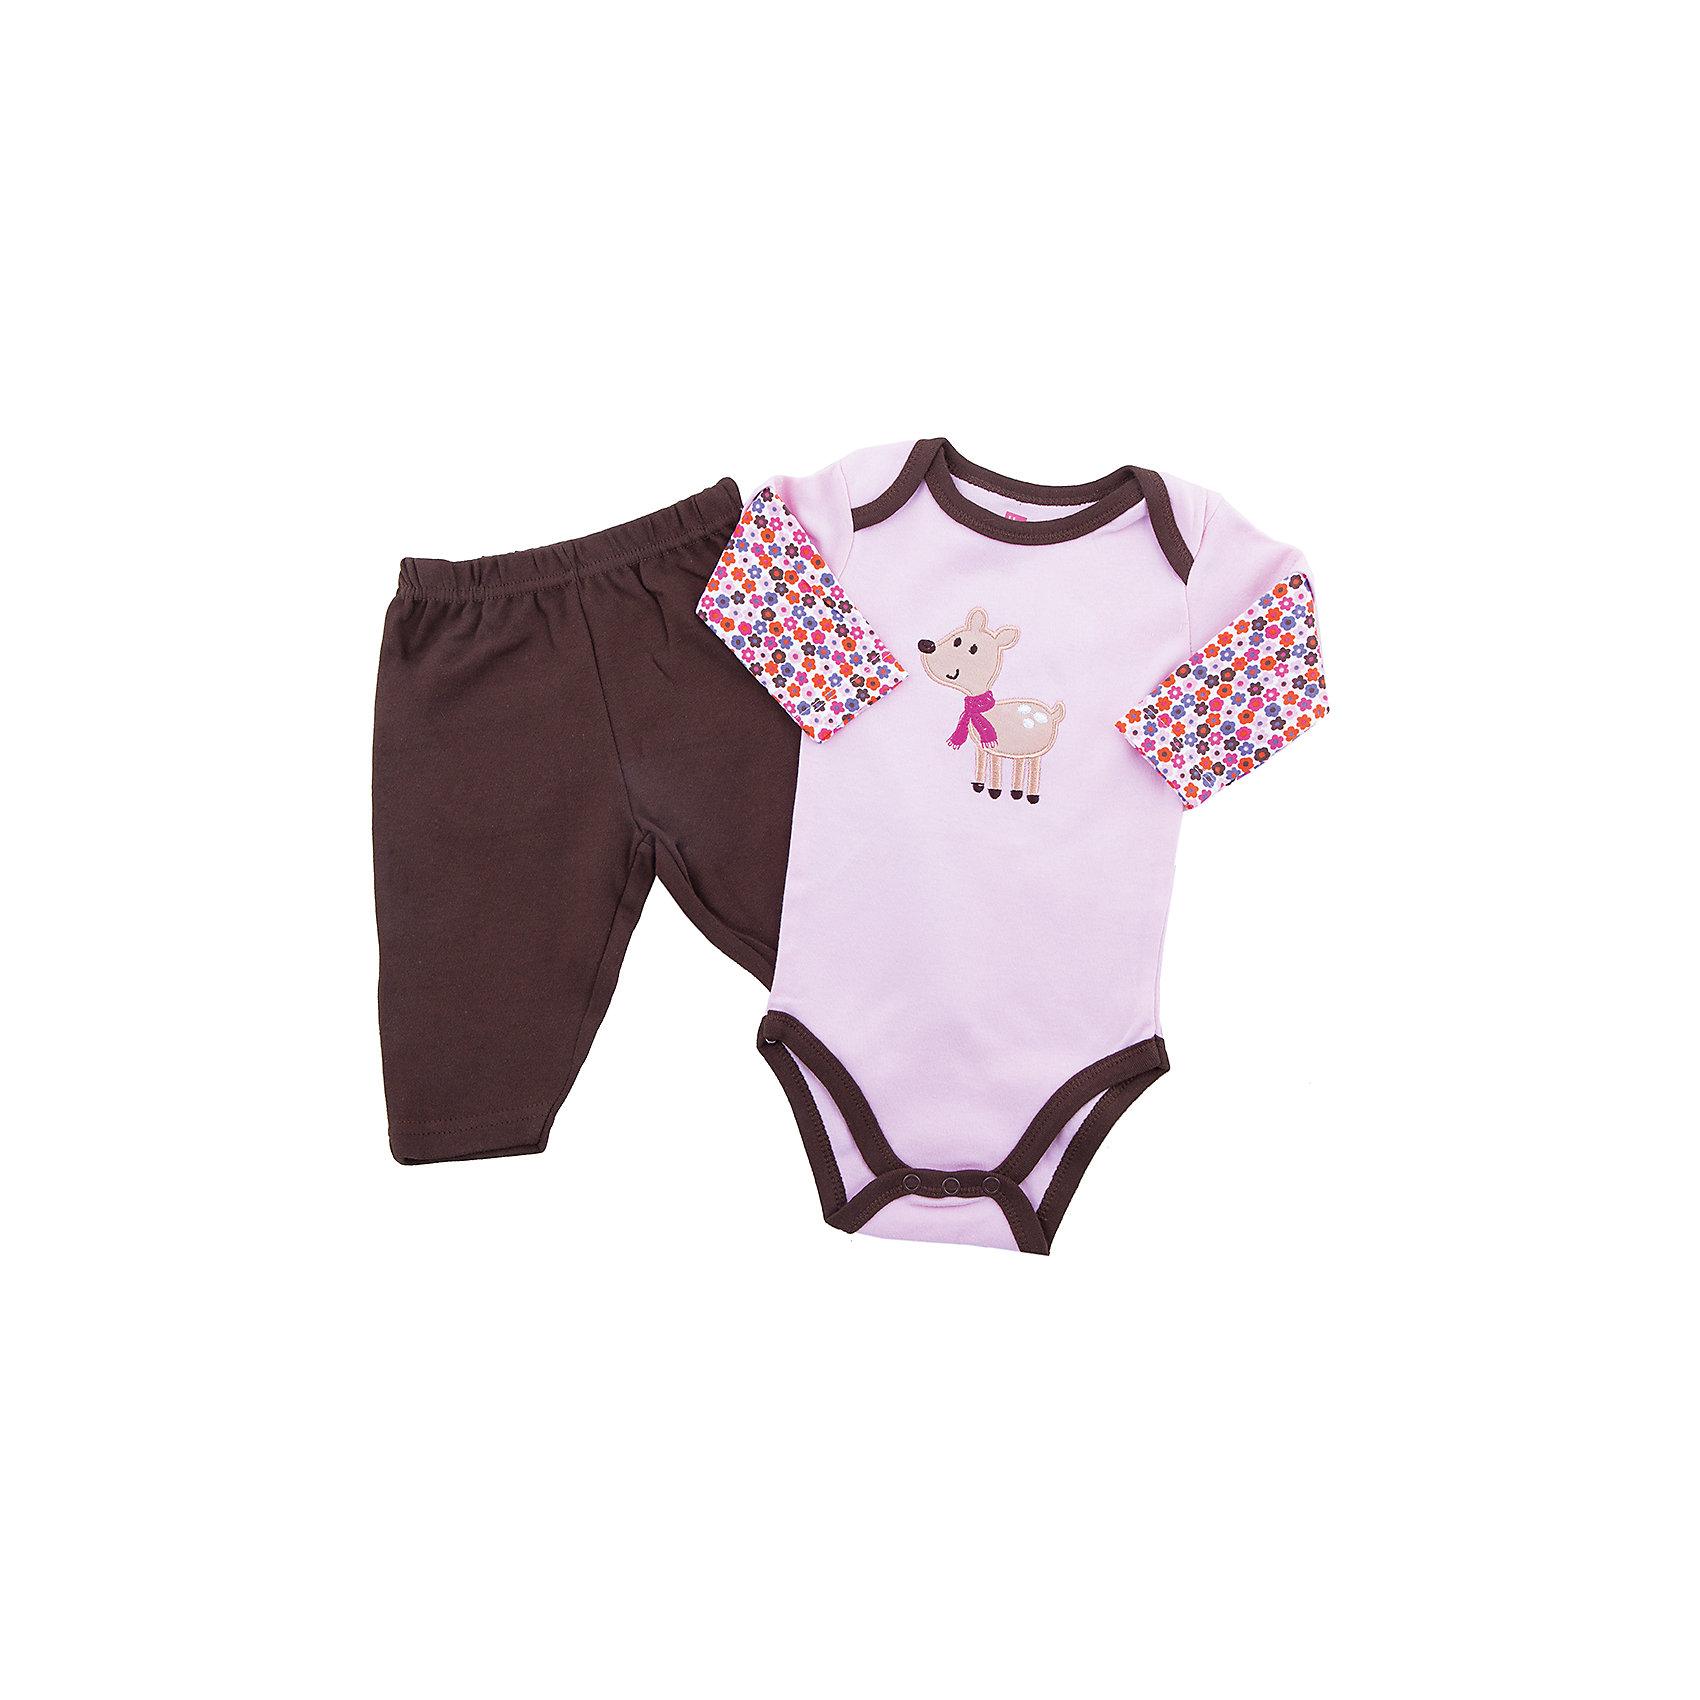 Hudson Baby Комплект для девочки: боди и штанишки для девочки Hudson Baby hudson baby комплект для девочки боди и штанишки для девочки hudson baby